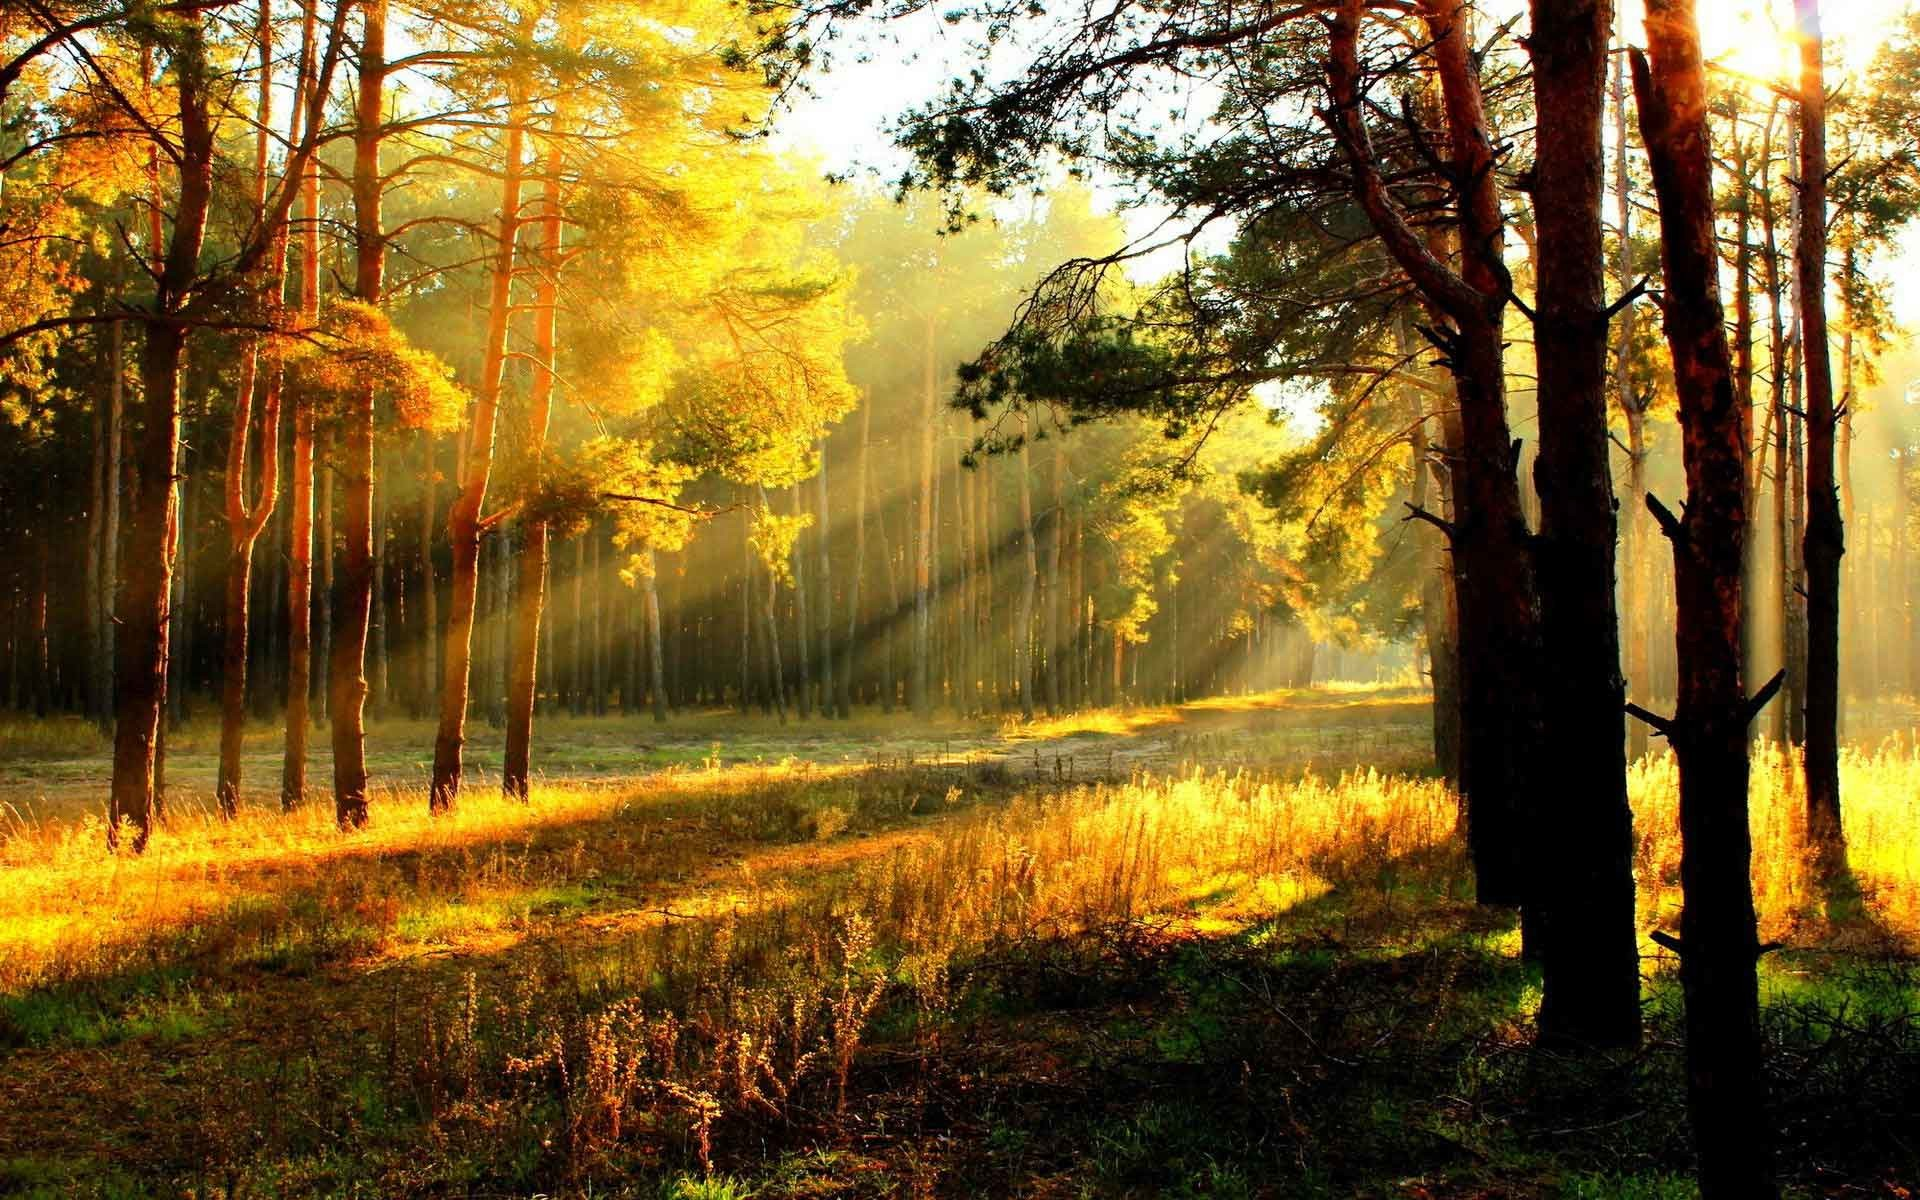 Fall Leaves Iphone 6 Plus Wallpaper Autumn Landscape Wallpaper 69 Images